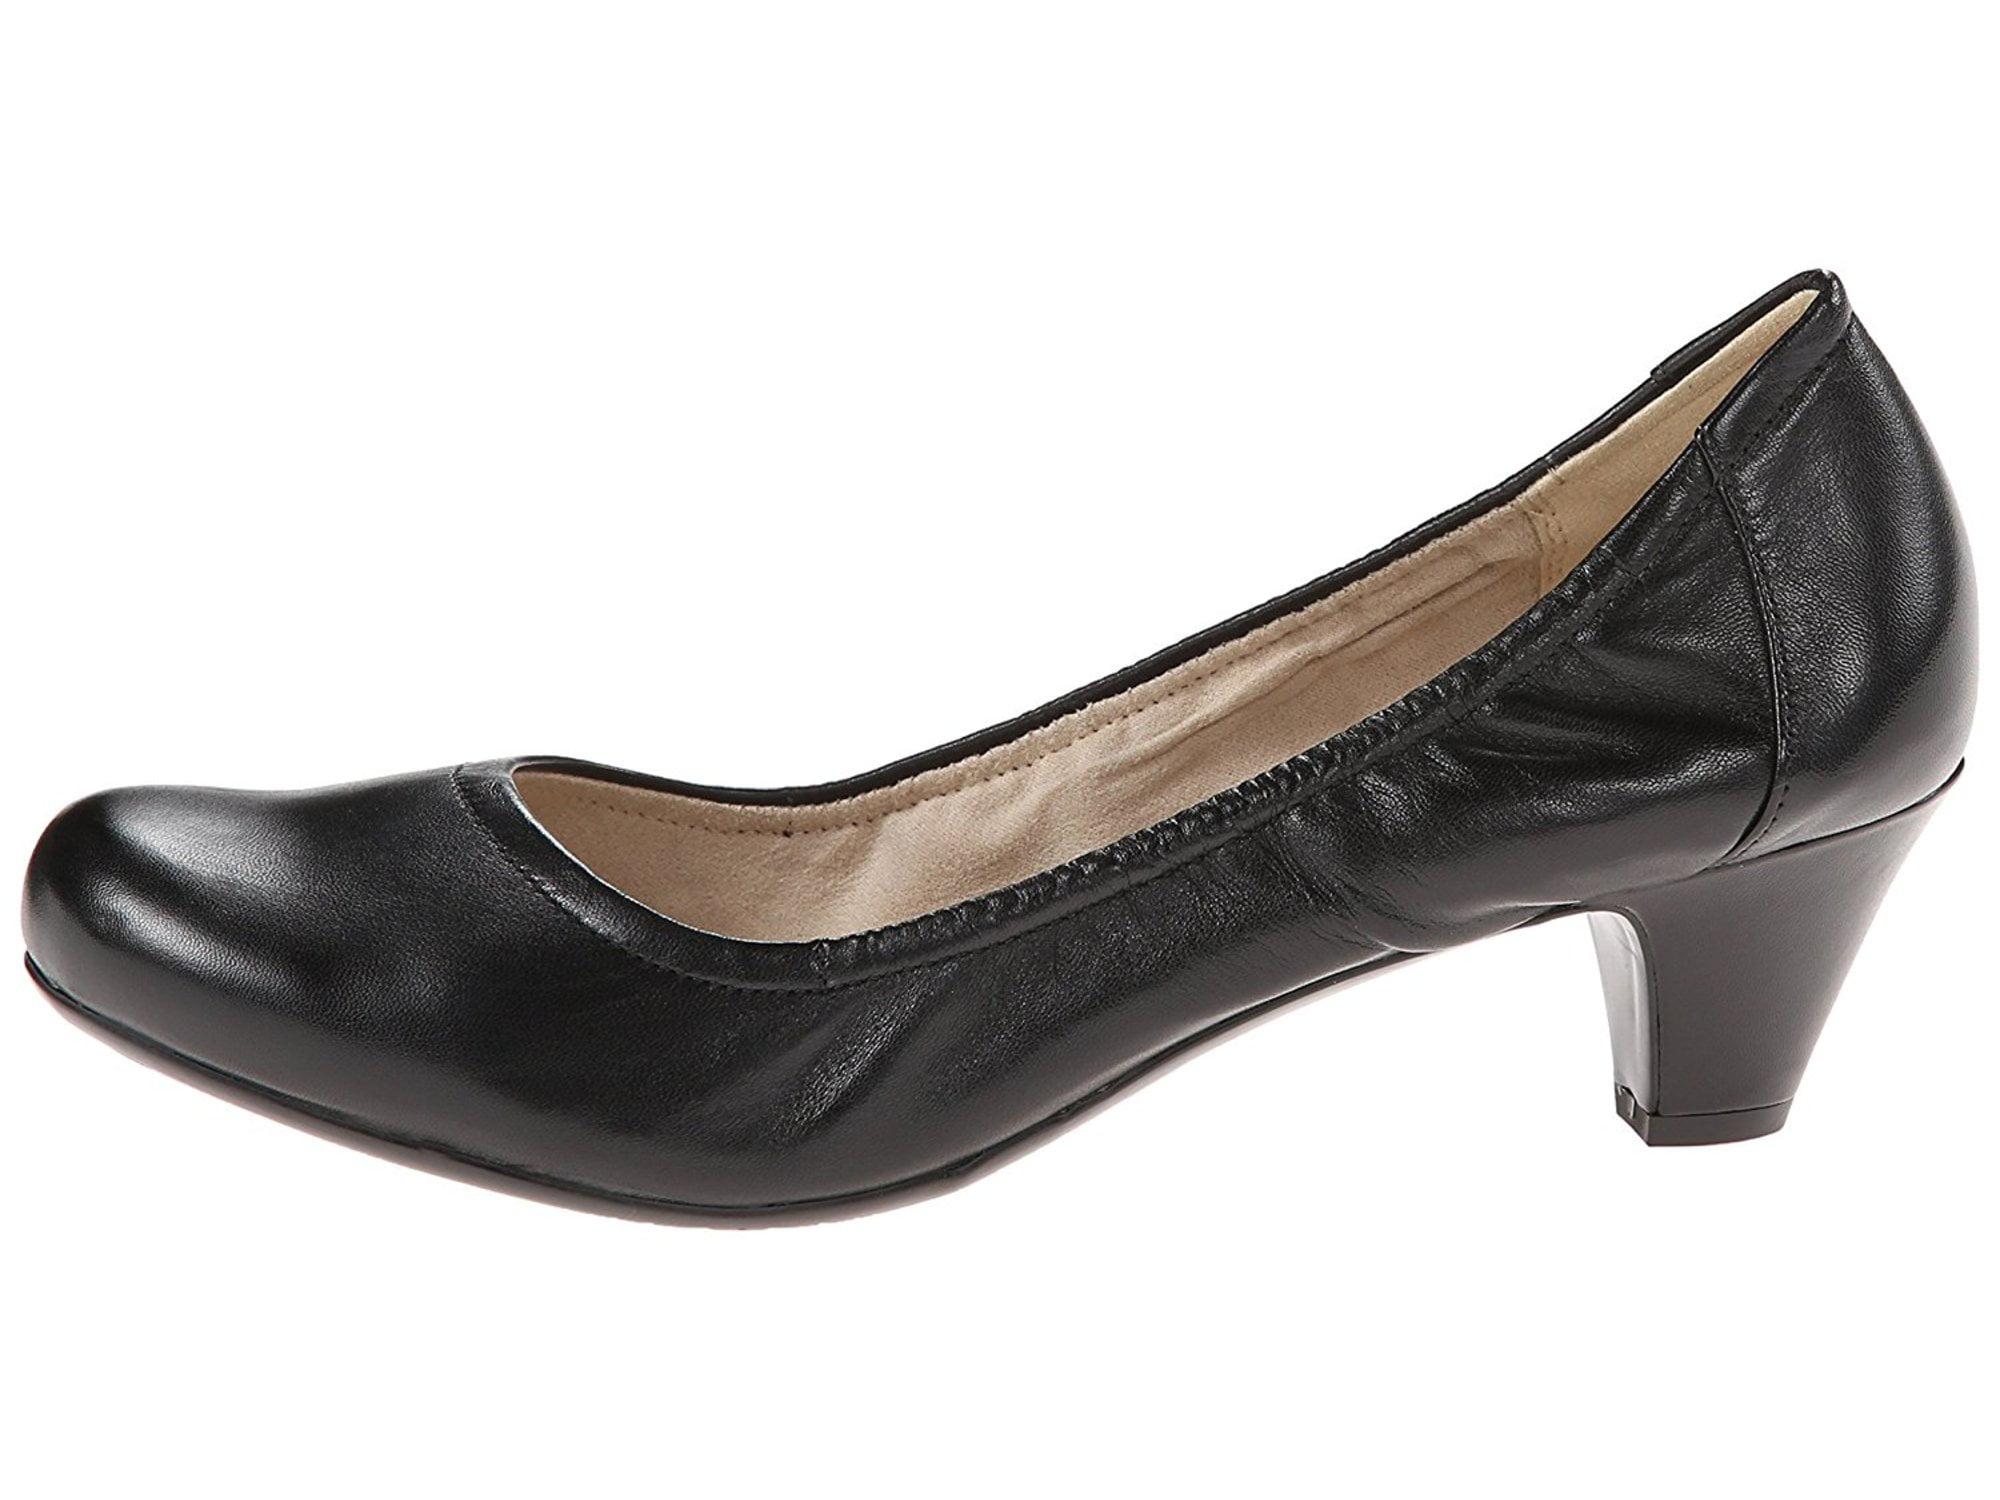 c5326b58f40 Naturalizer Womens Stargaze Leather Closed Toe Classic Pumps